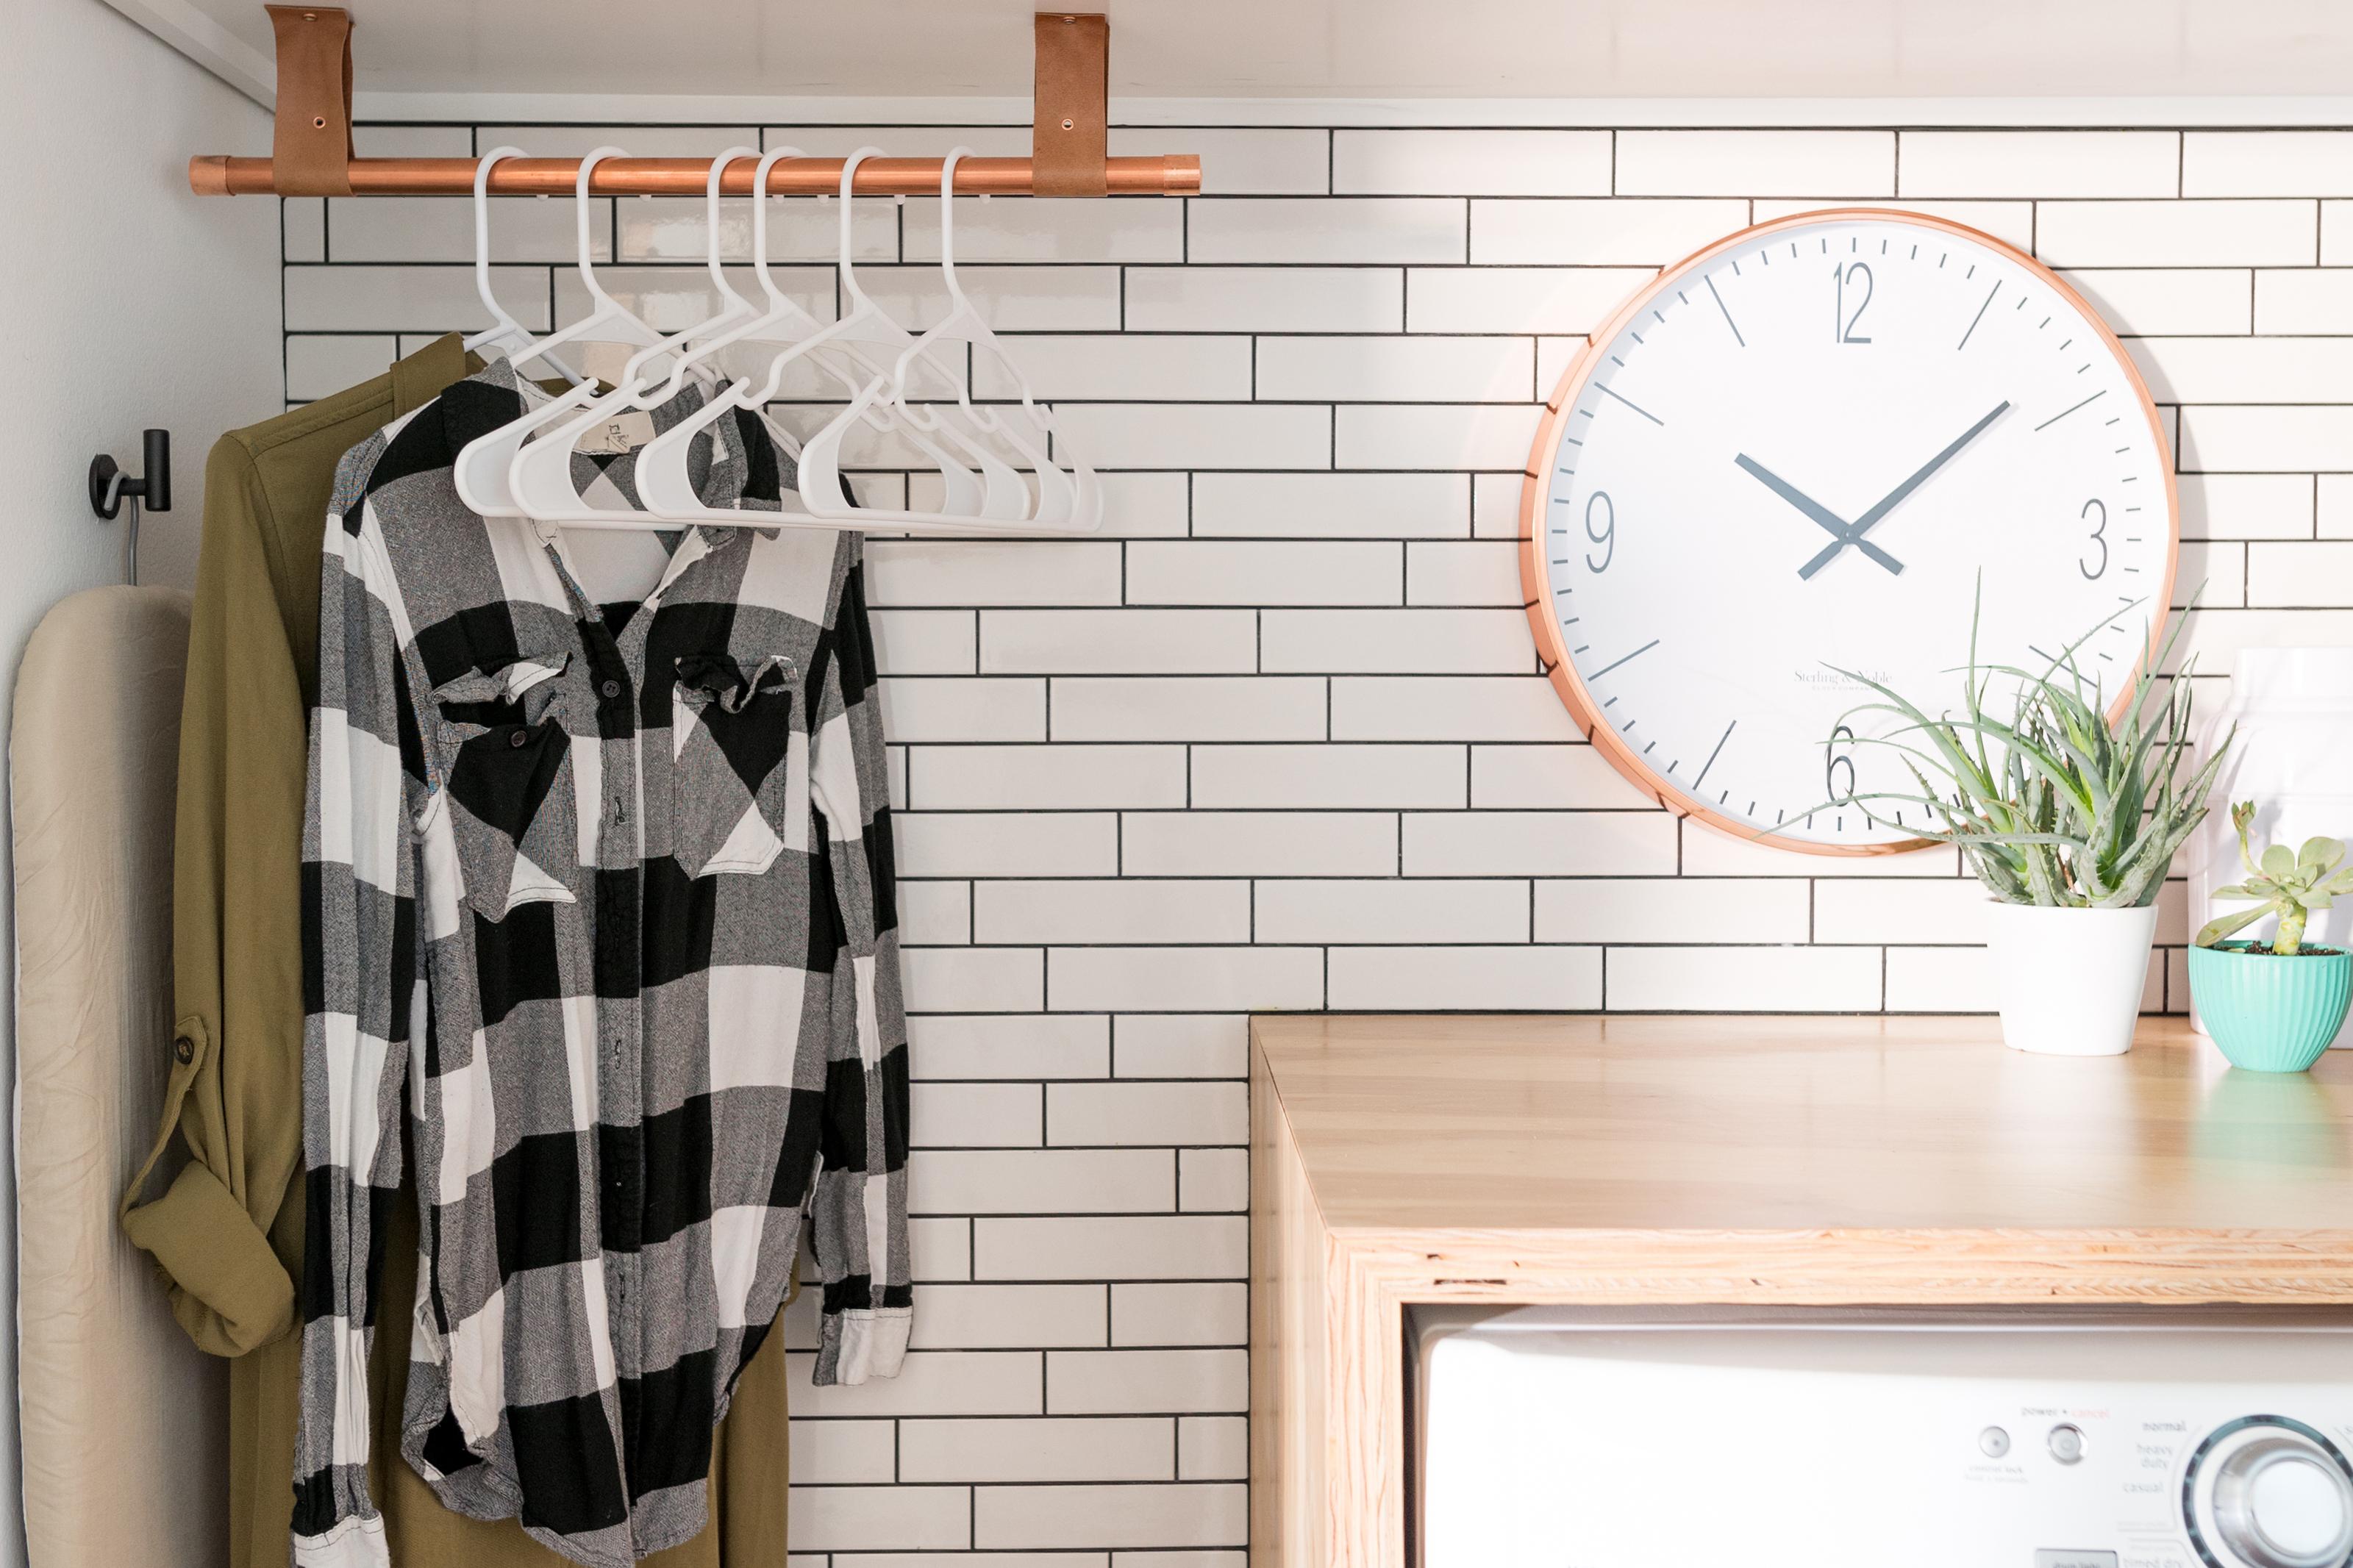 Subway tile backsplash in a home laundry room